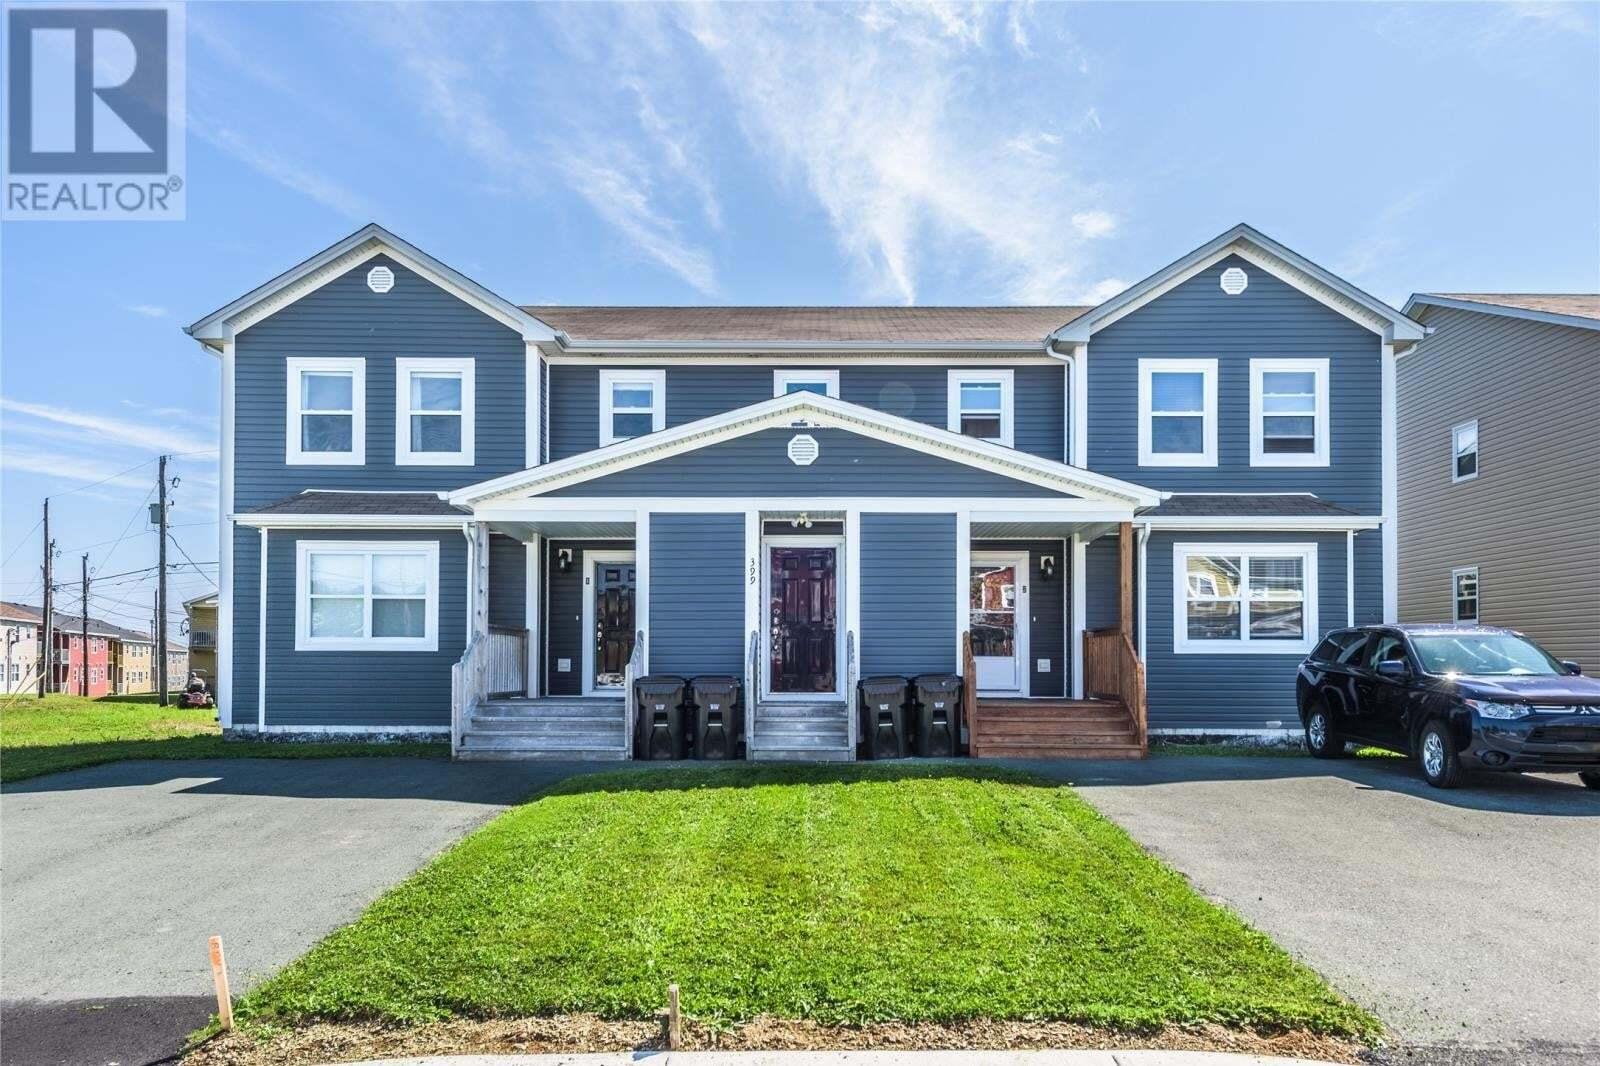 House for sale at 399 Blackmarsh Rd St. John's Newfoundland - MLS: 1218652